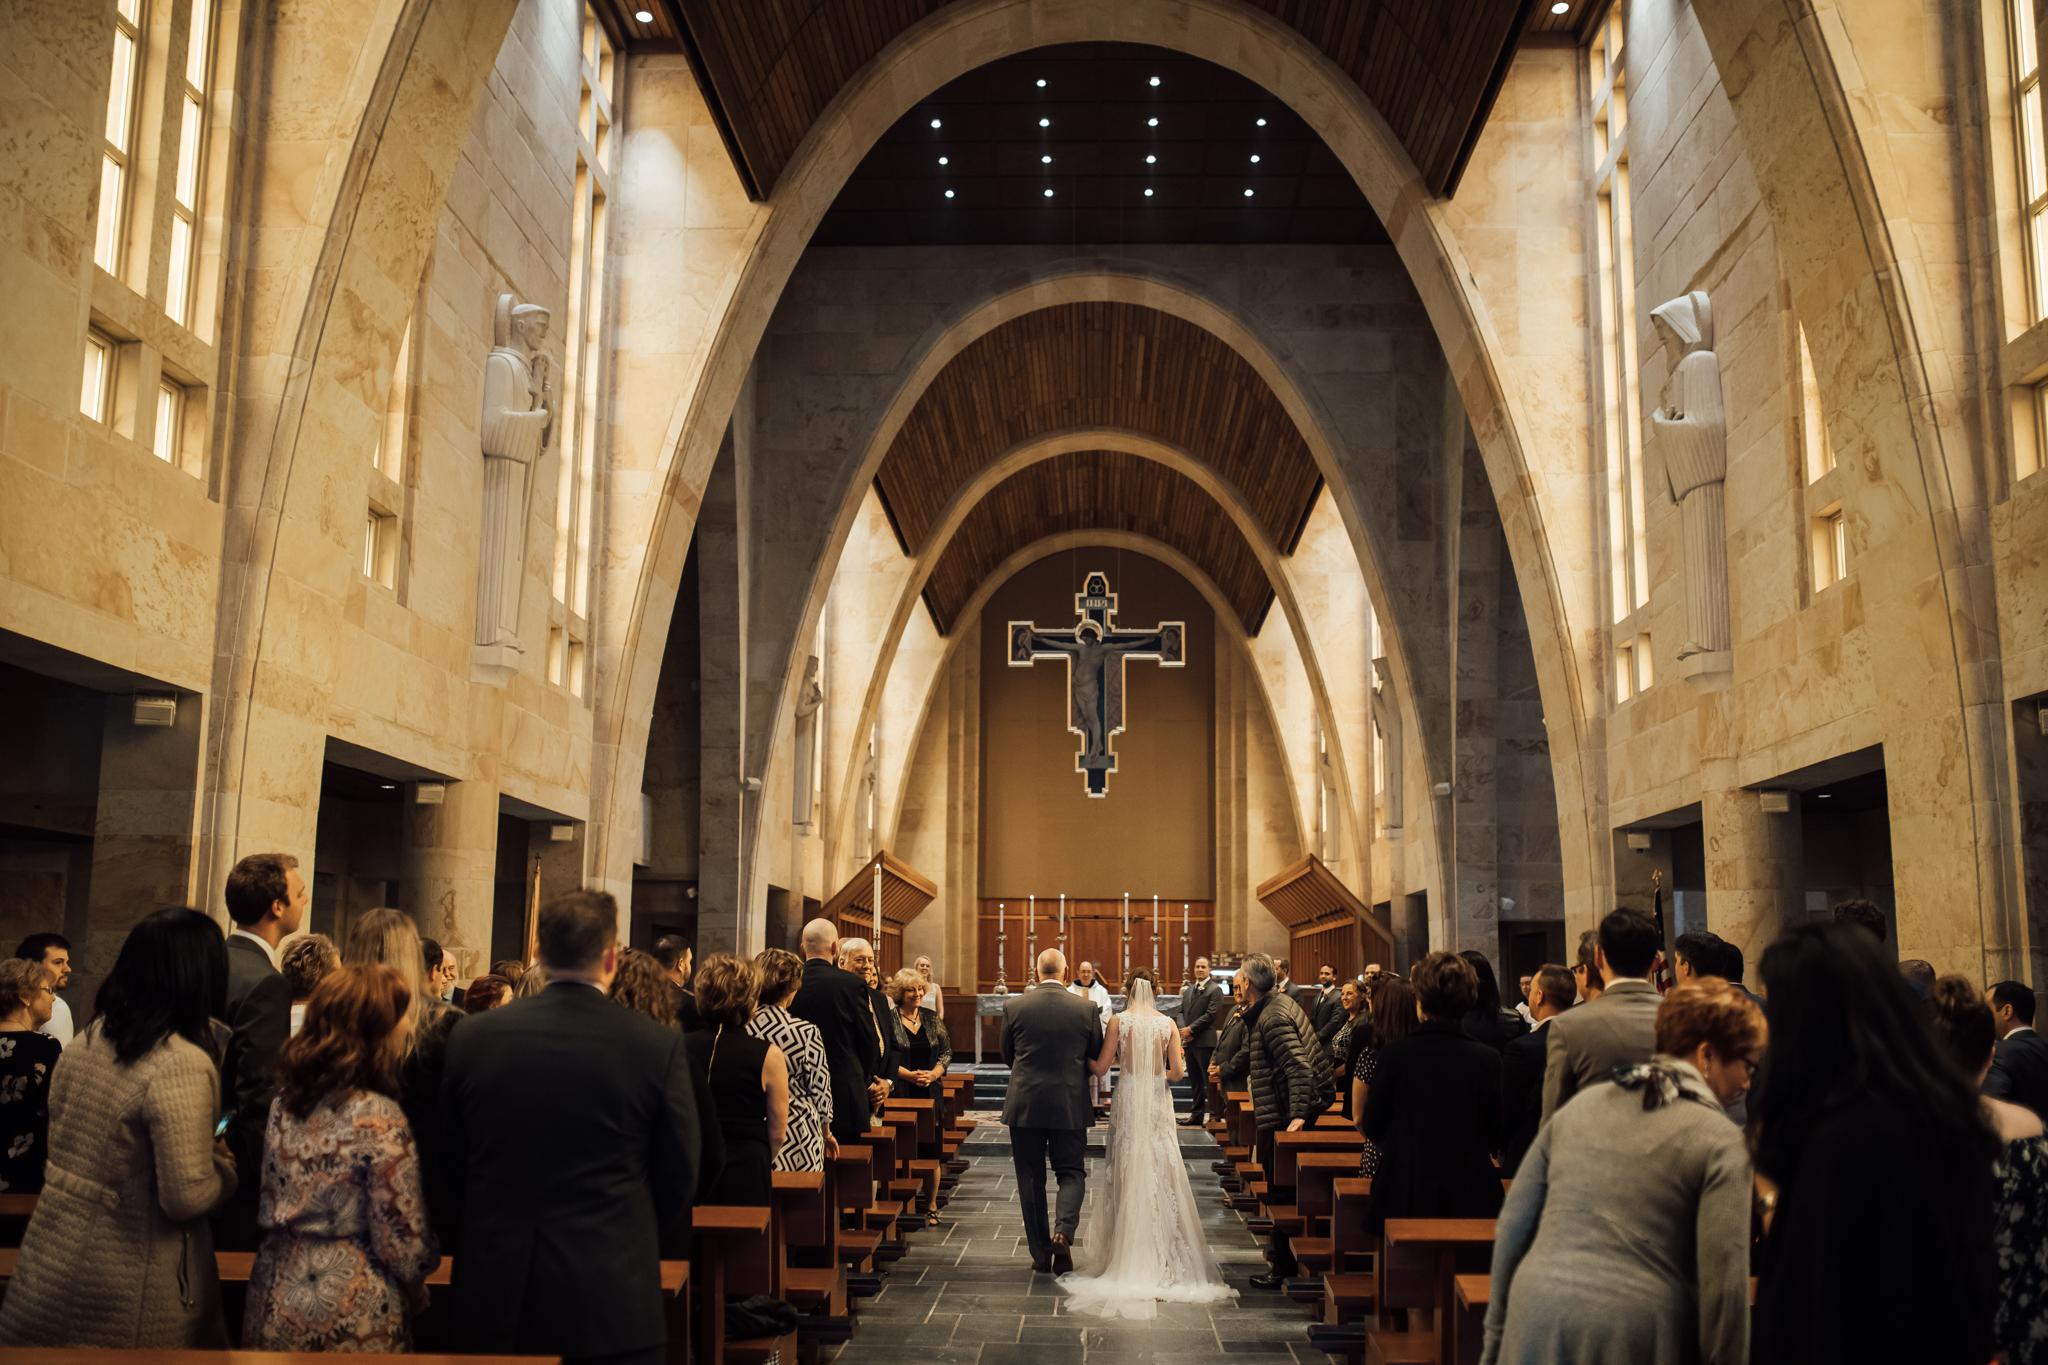 birmingham-alabama-wedding-photographer-laura-terry-the-warmth-around-you (75 of 110).jpg